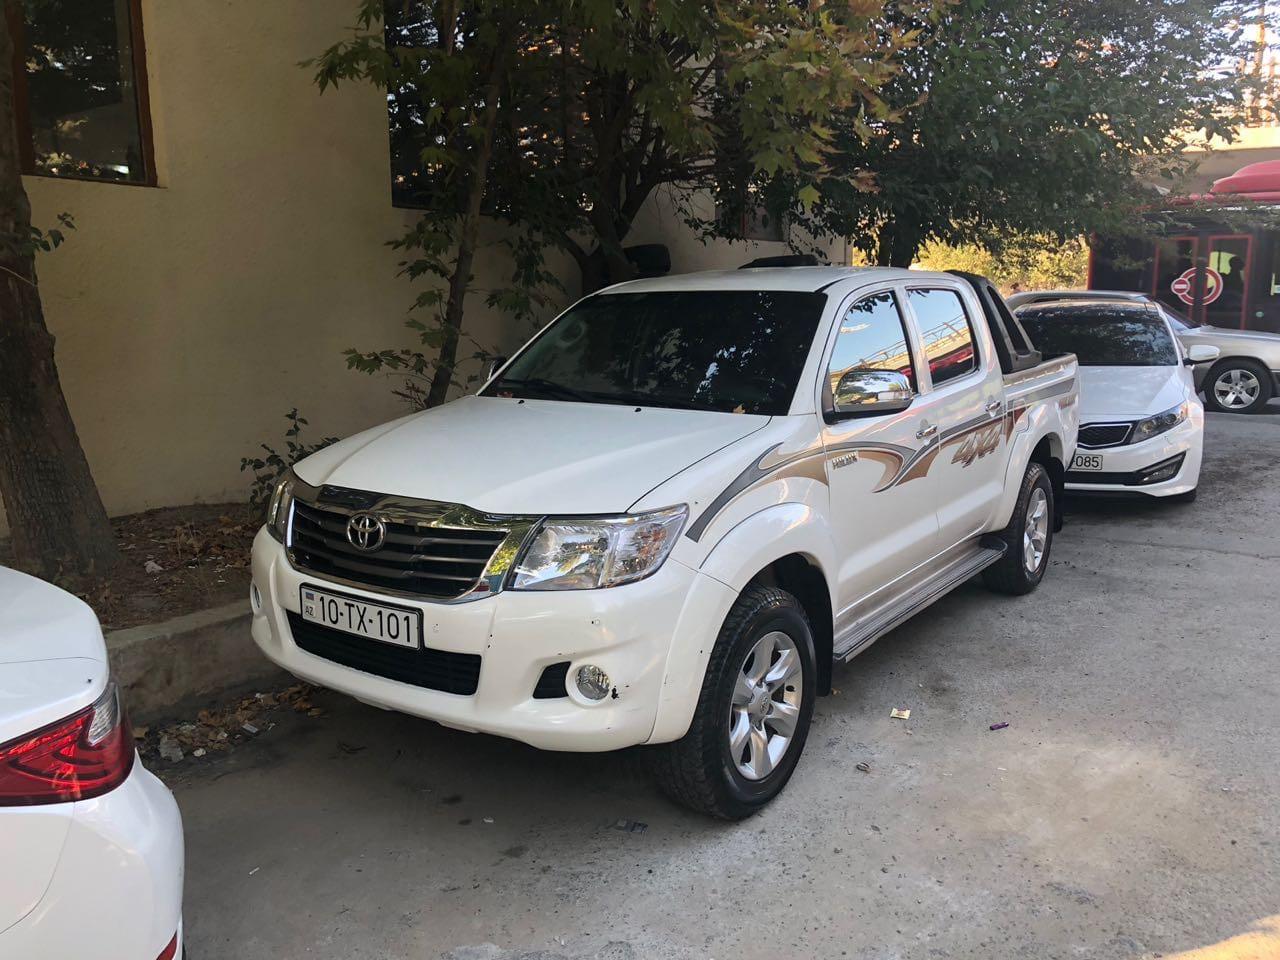 Toyota Hilux / rental cars in Baku / avtomobil kirayesi / аренда машин в Баку